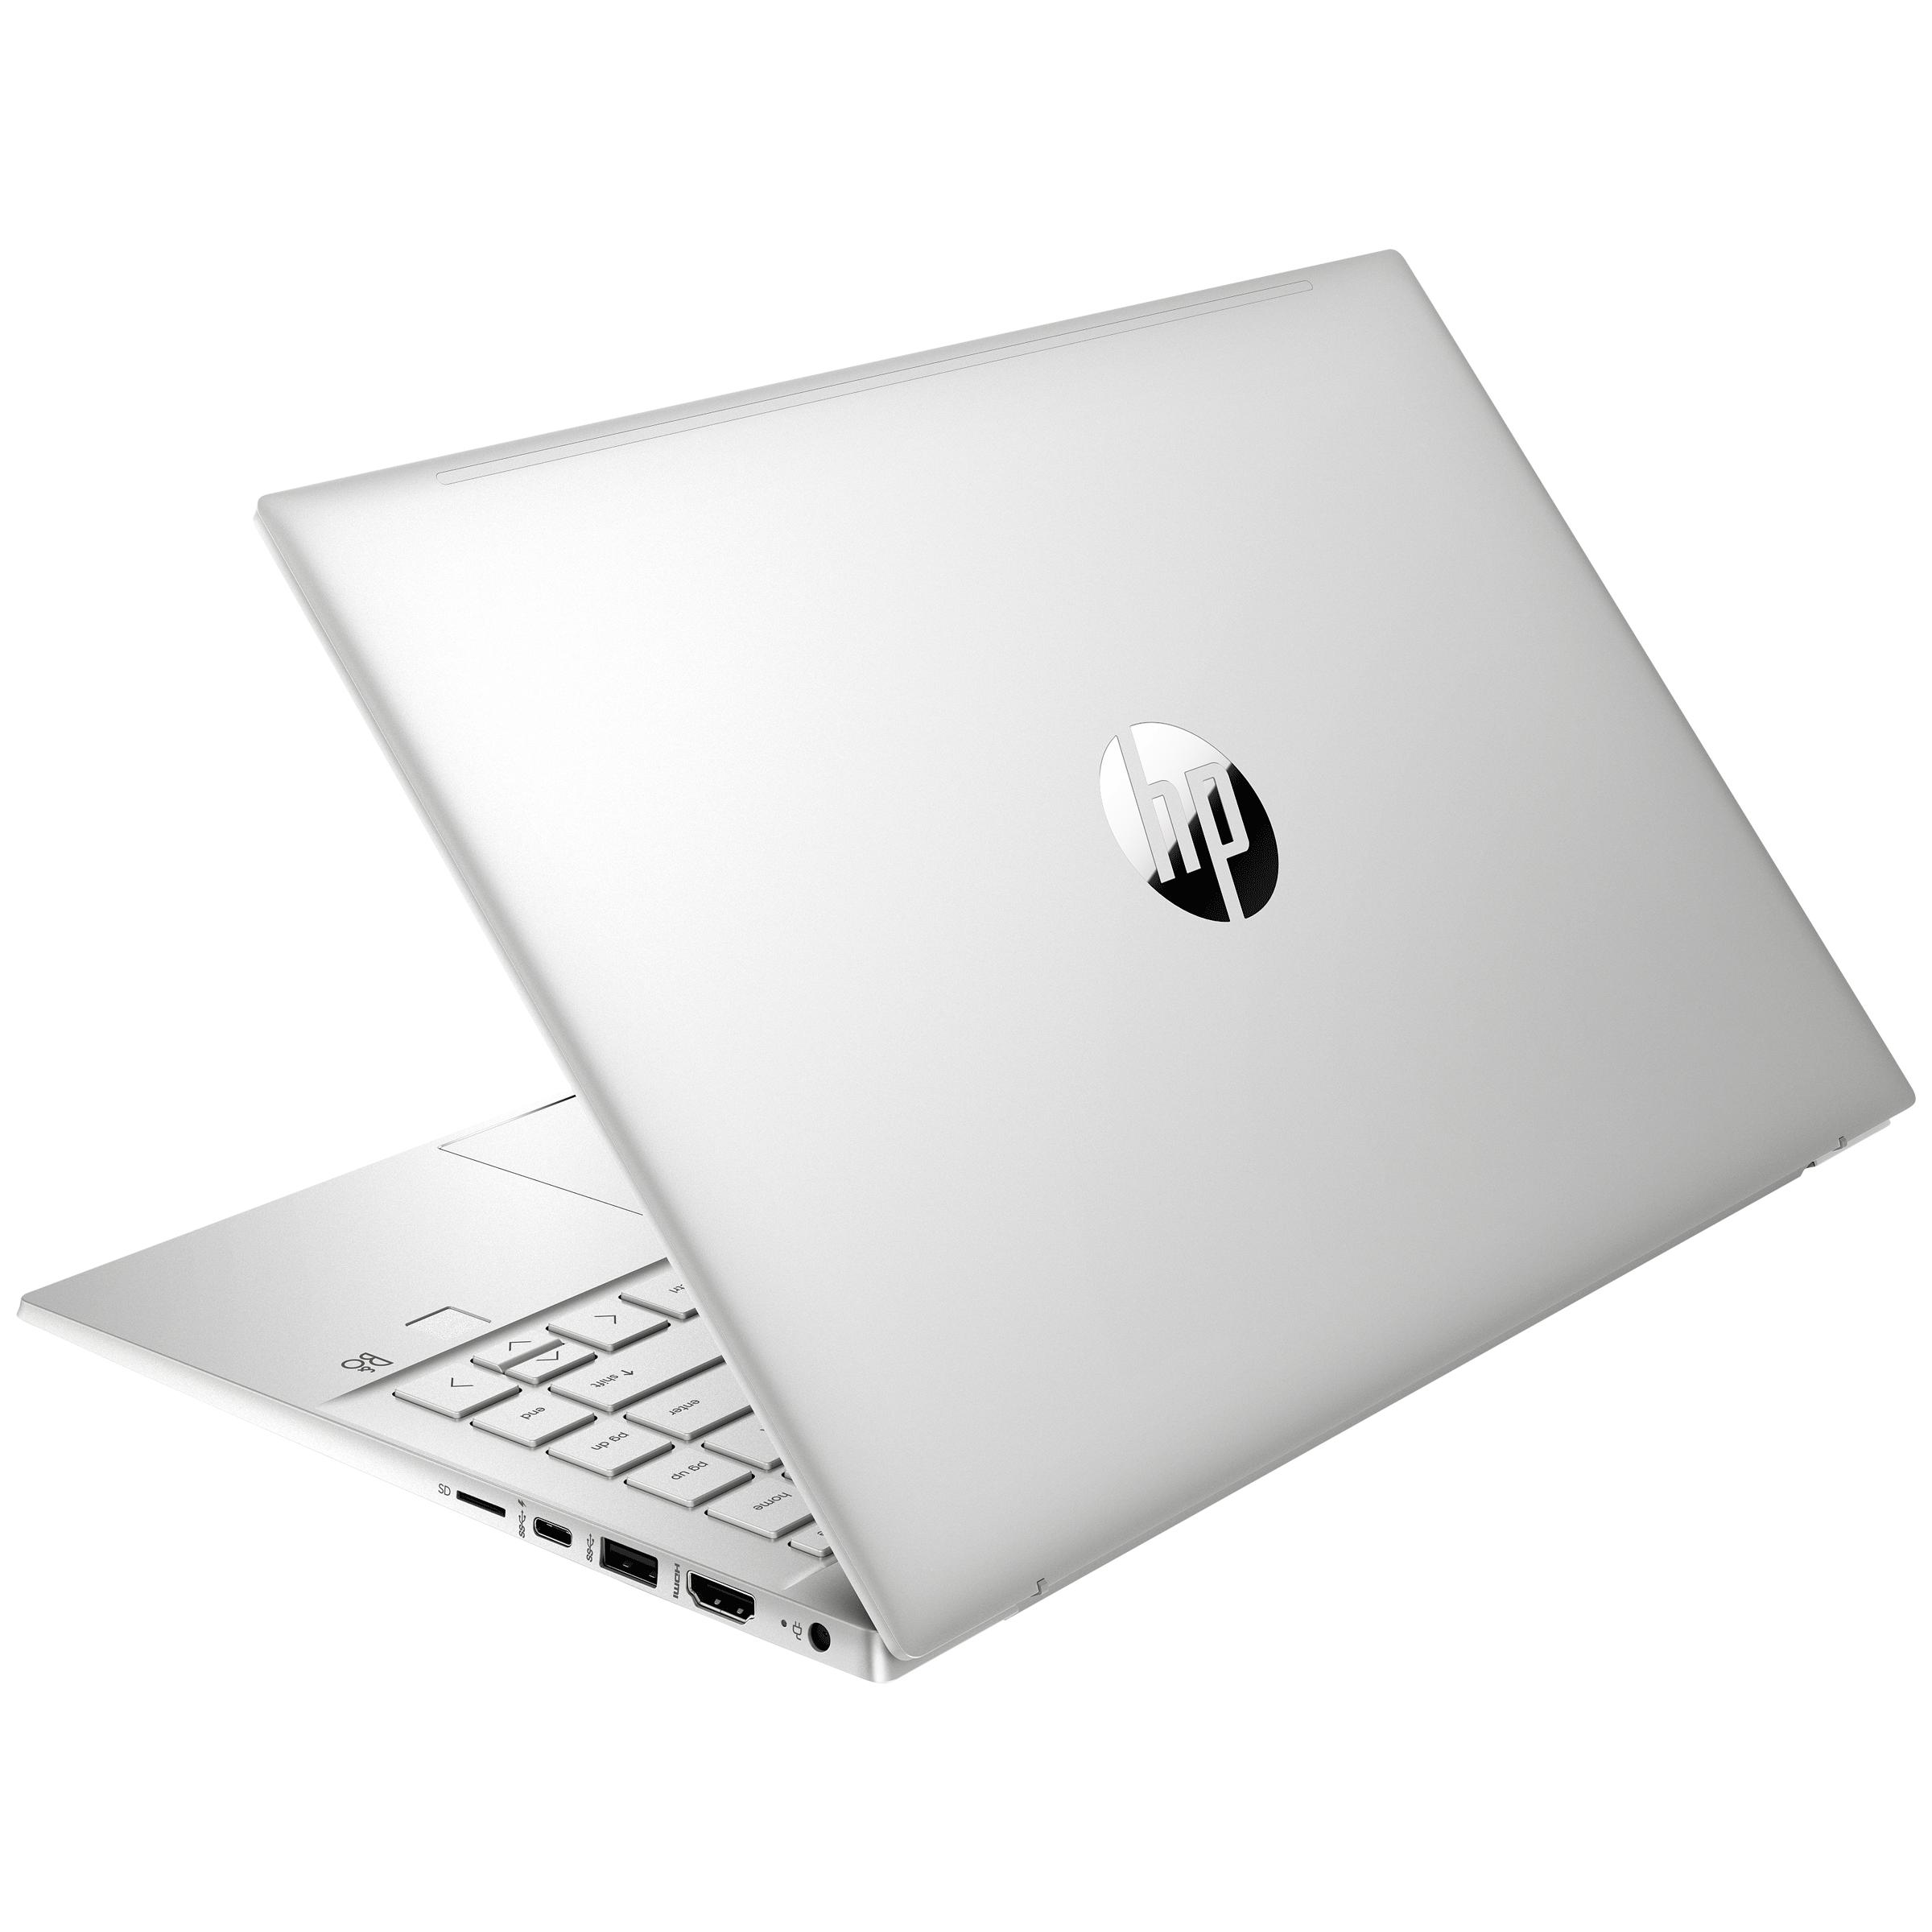 HP Pavilion 14-dv0086TX (397L9PA#ACJ) Core i5 11th Gen Windows 10 Home Laptop (16GB RAM, 512GB SSD, GeForce MX450 + 2GB Graphics, MS Office,... 6